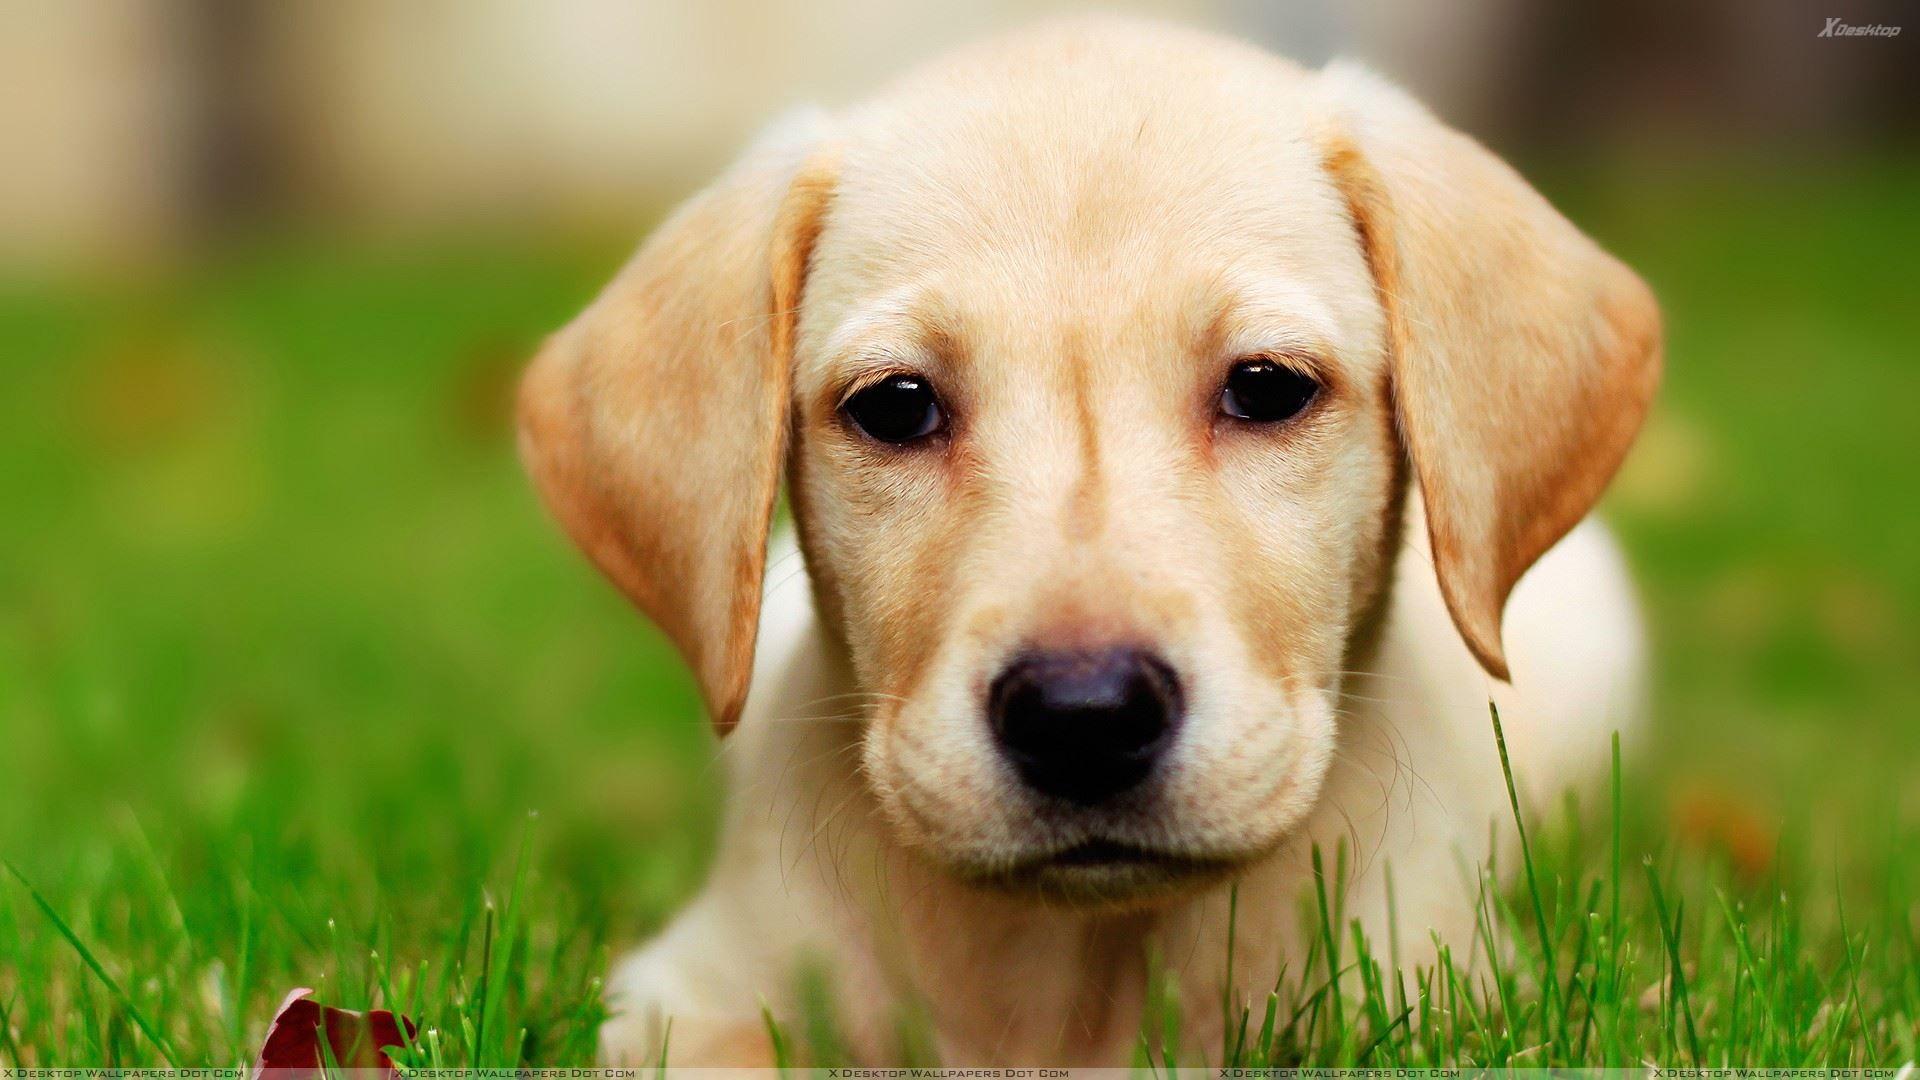 sweet innocent face little dog | archetypes | pinterest | hd